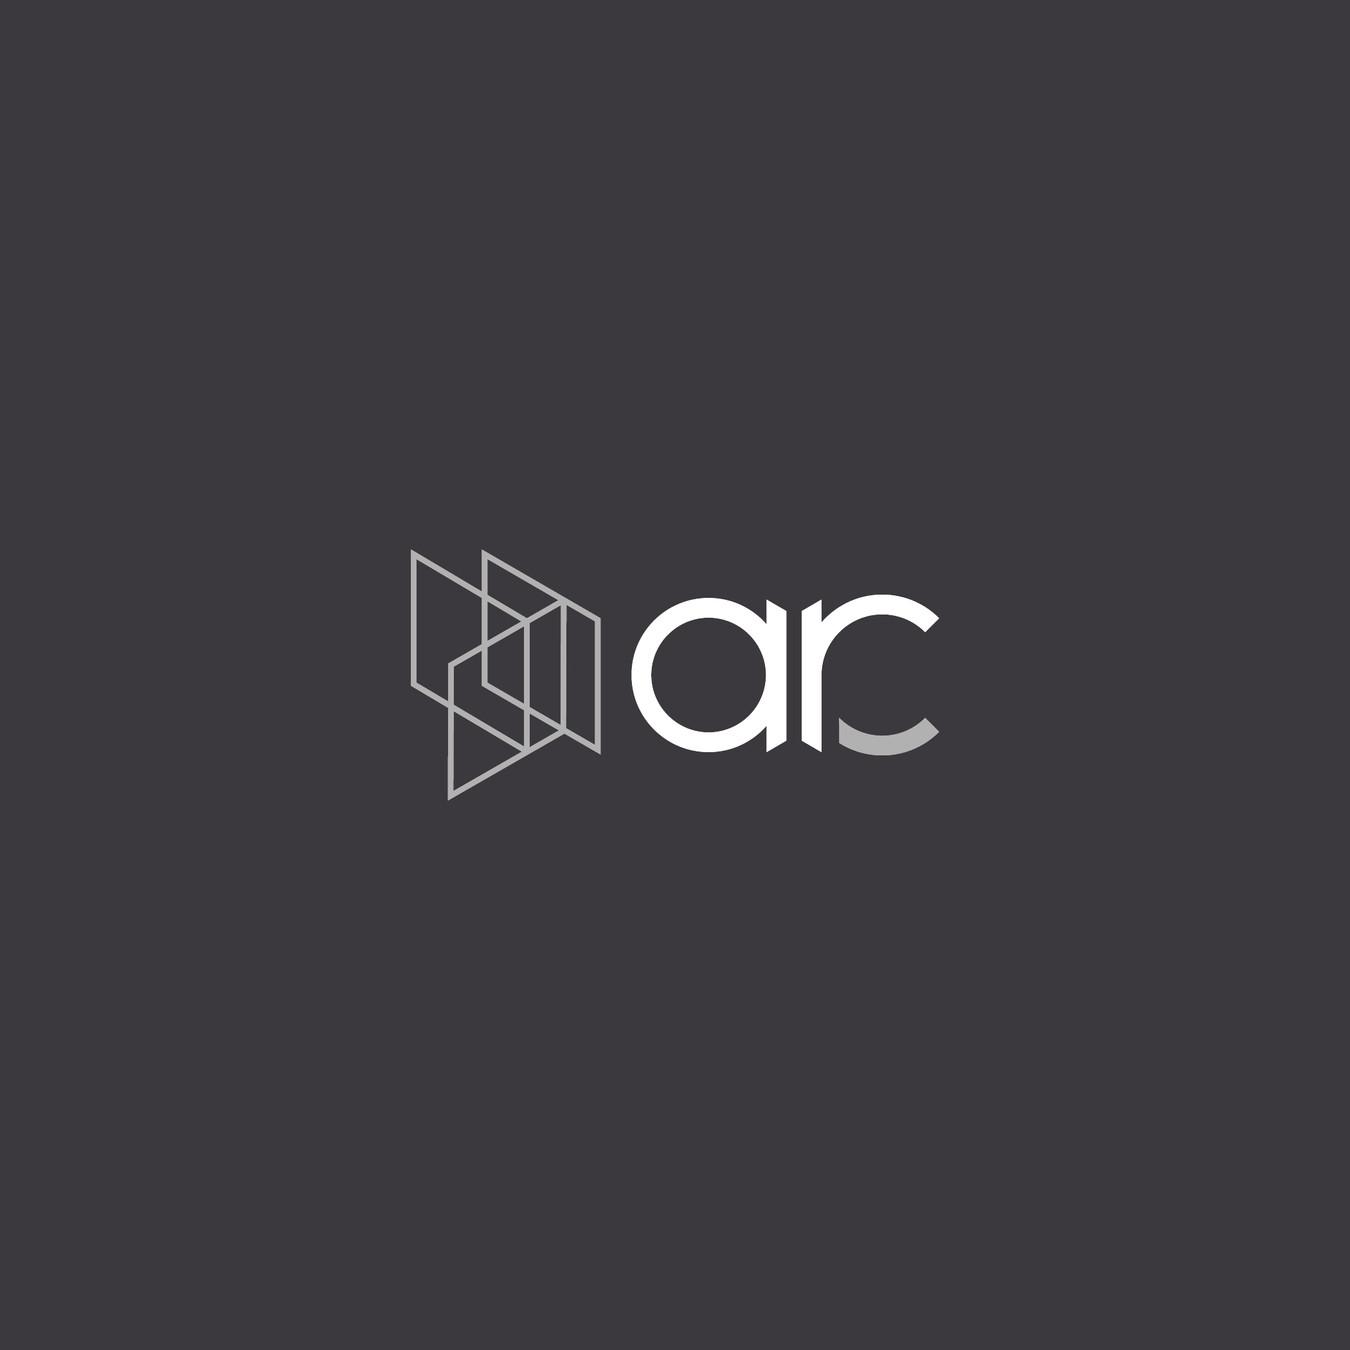 arc_logo_whiteongrey.jpg